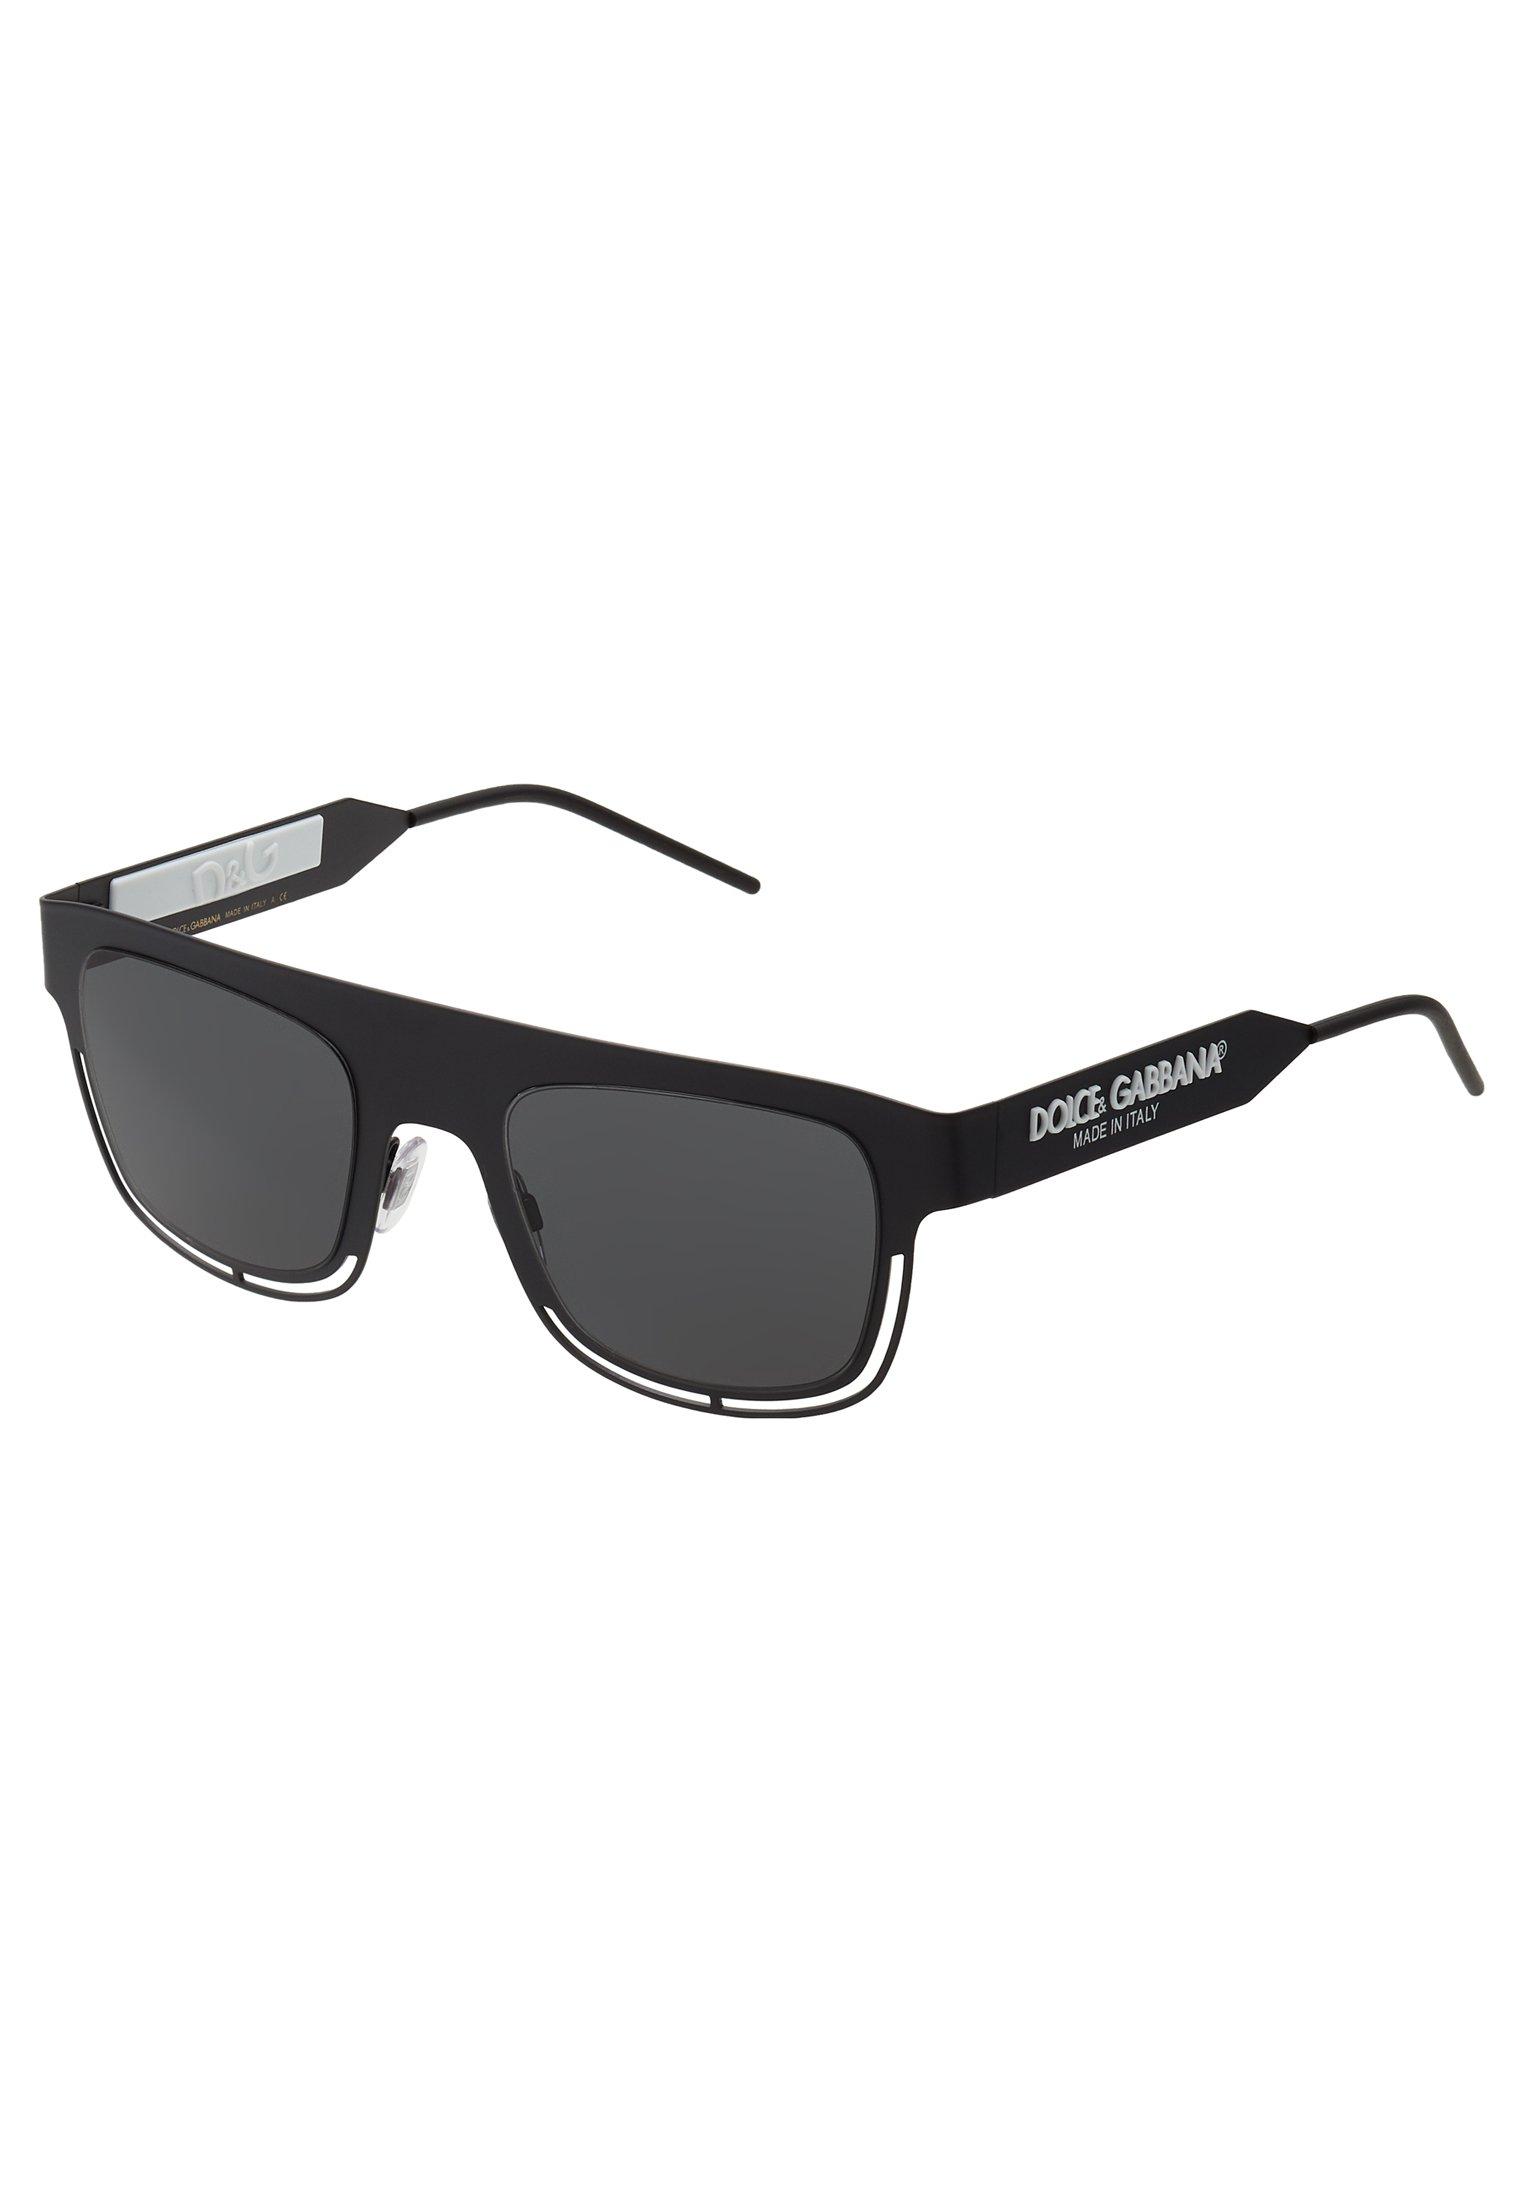 Dolce&Gabbana Solbriller - matte black/svart ocWThmyZzo275Bc